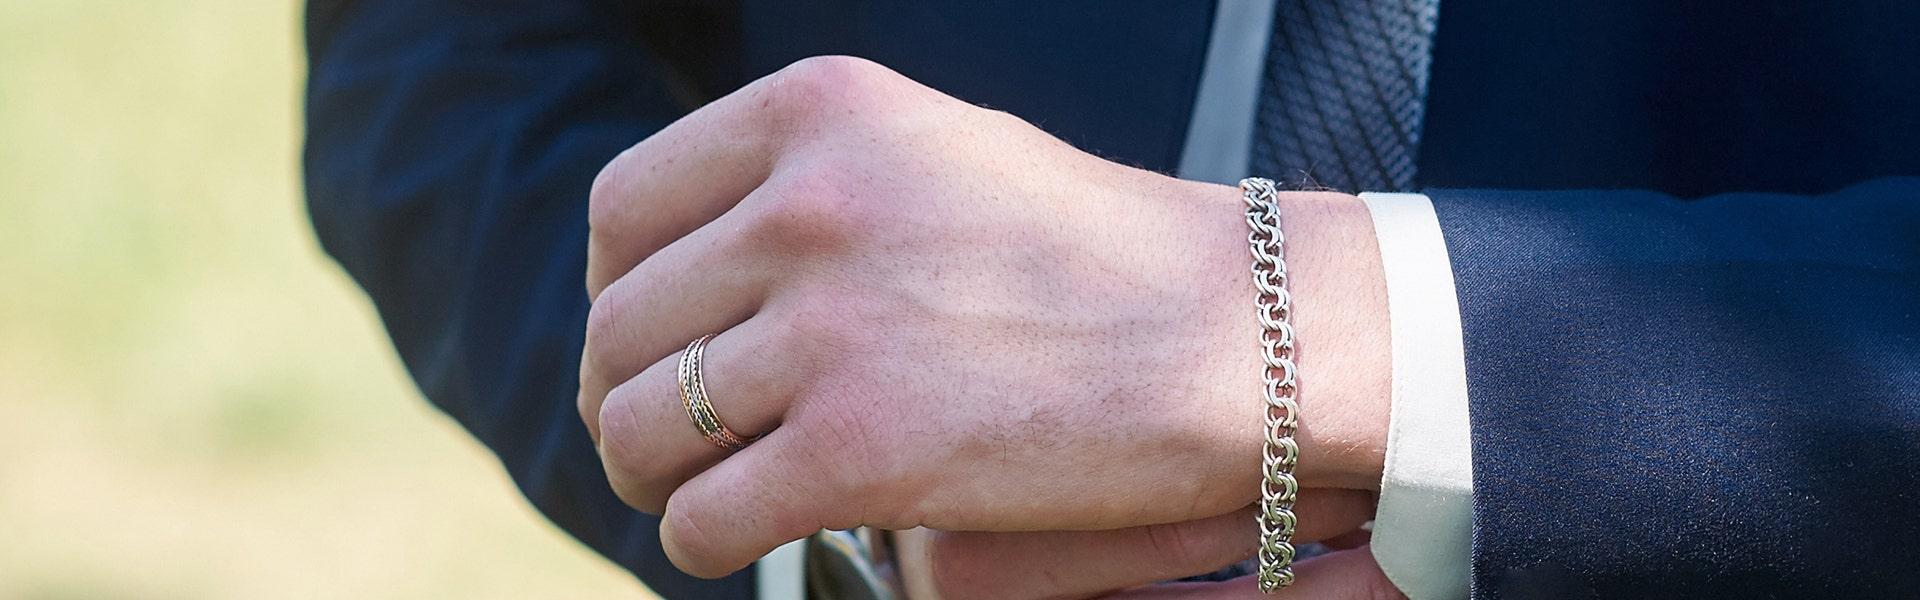 9d2c5a9cccd4f Men's Jewelry | Designer Chains, Rings, Bracelets & More